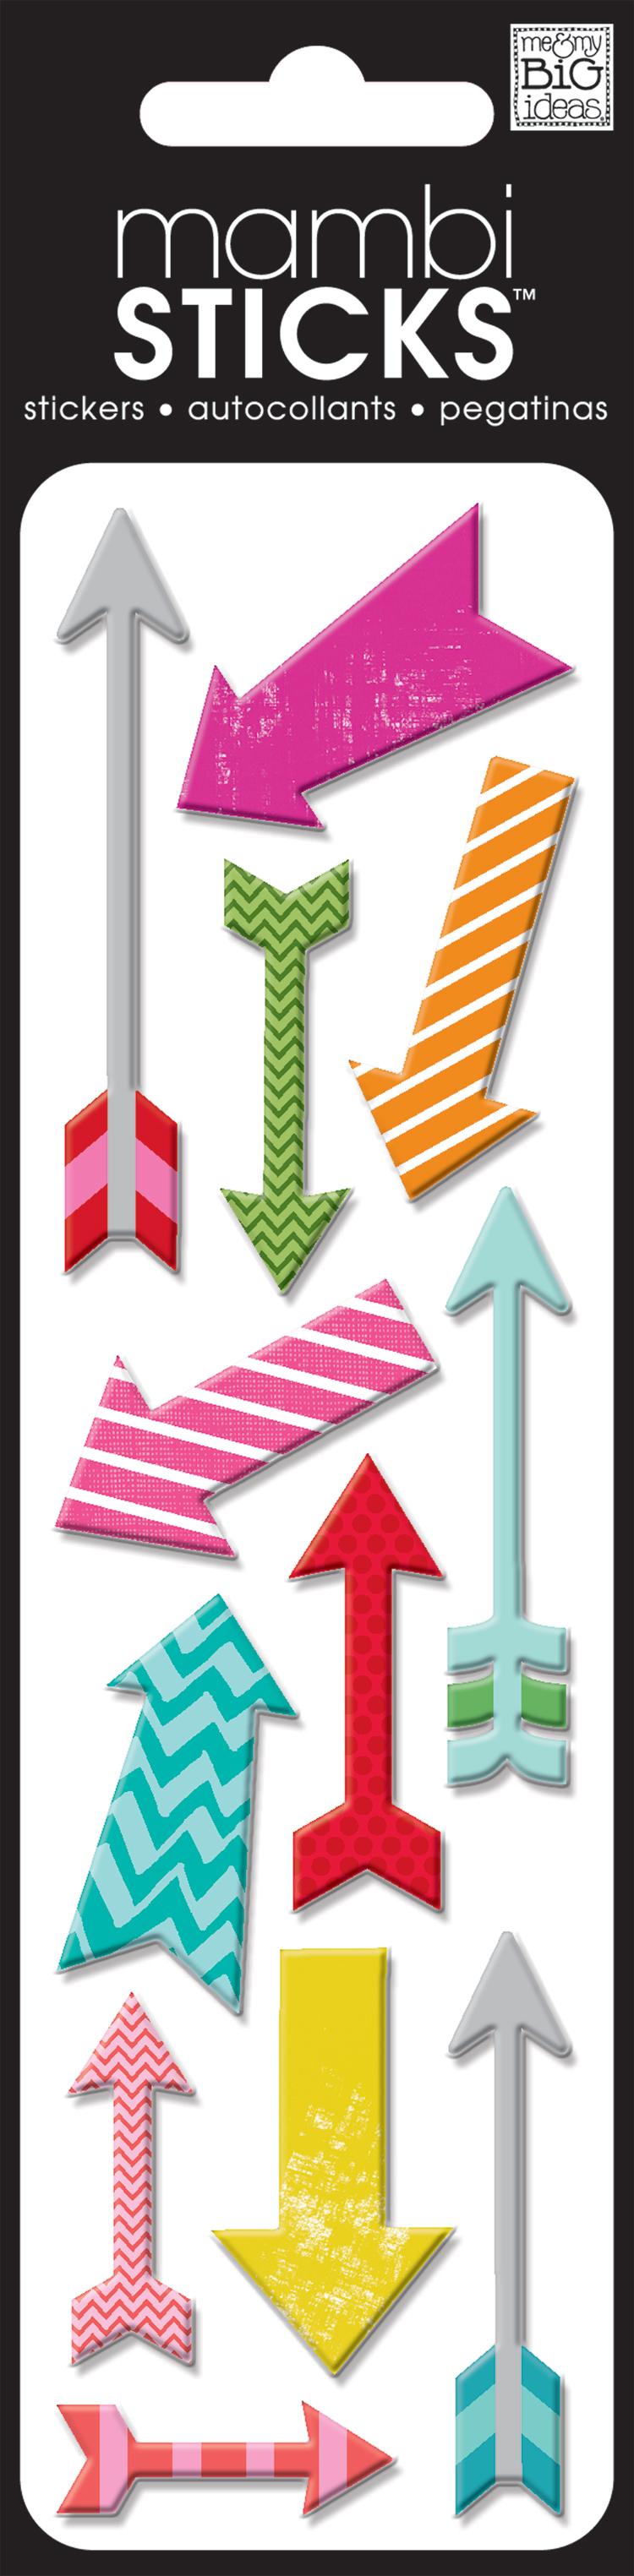 Puffy Multi Colored Arrow stickers - mambi STICKS - SPXH-243